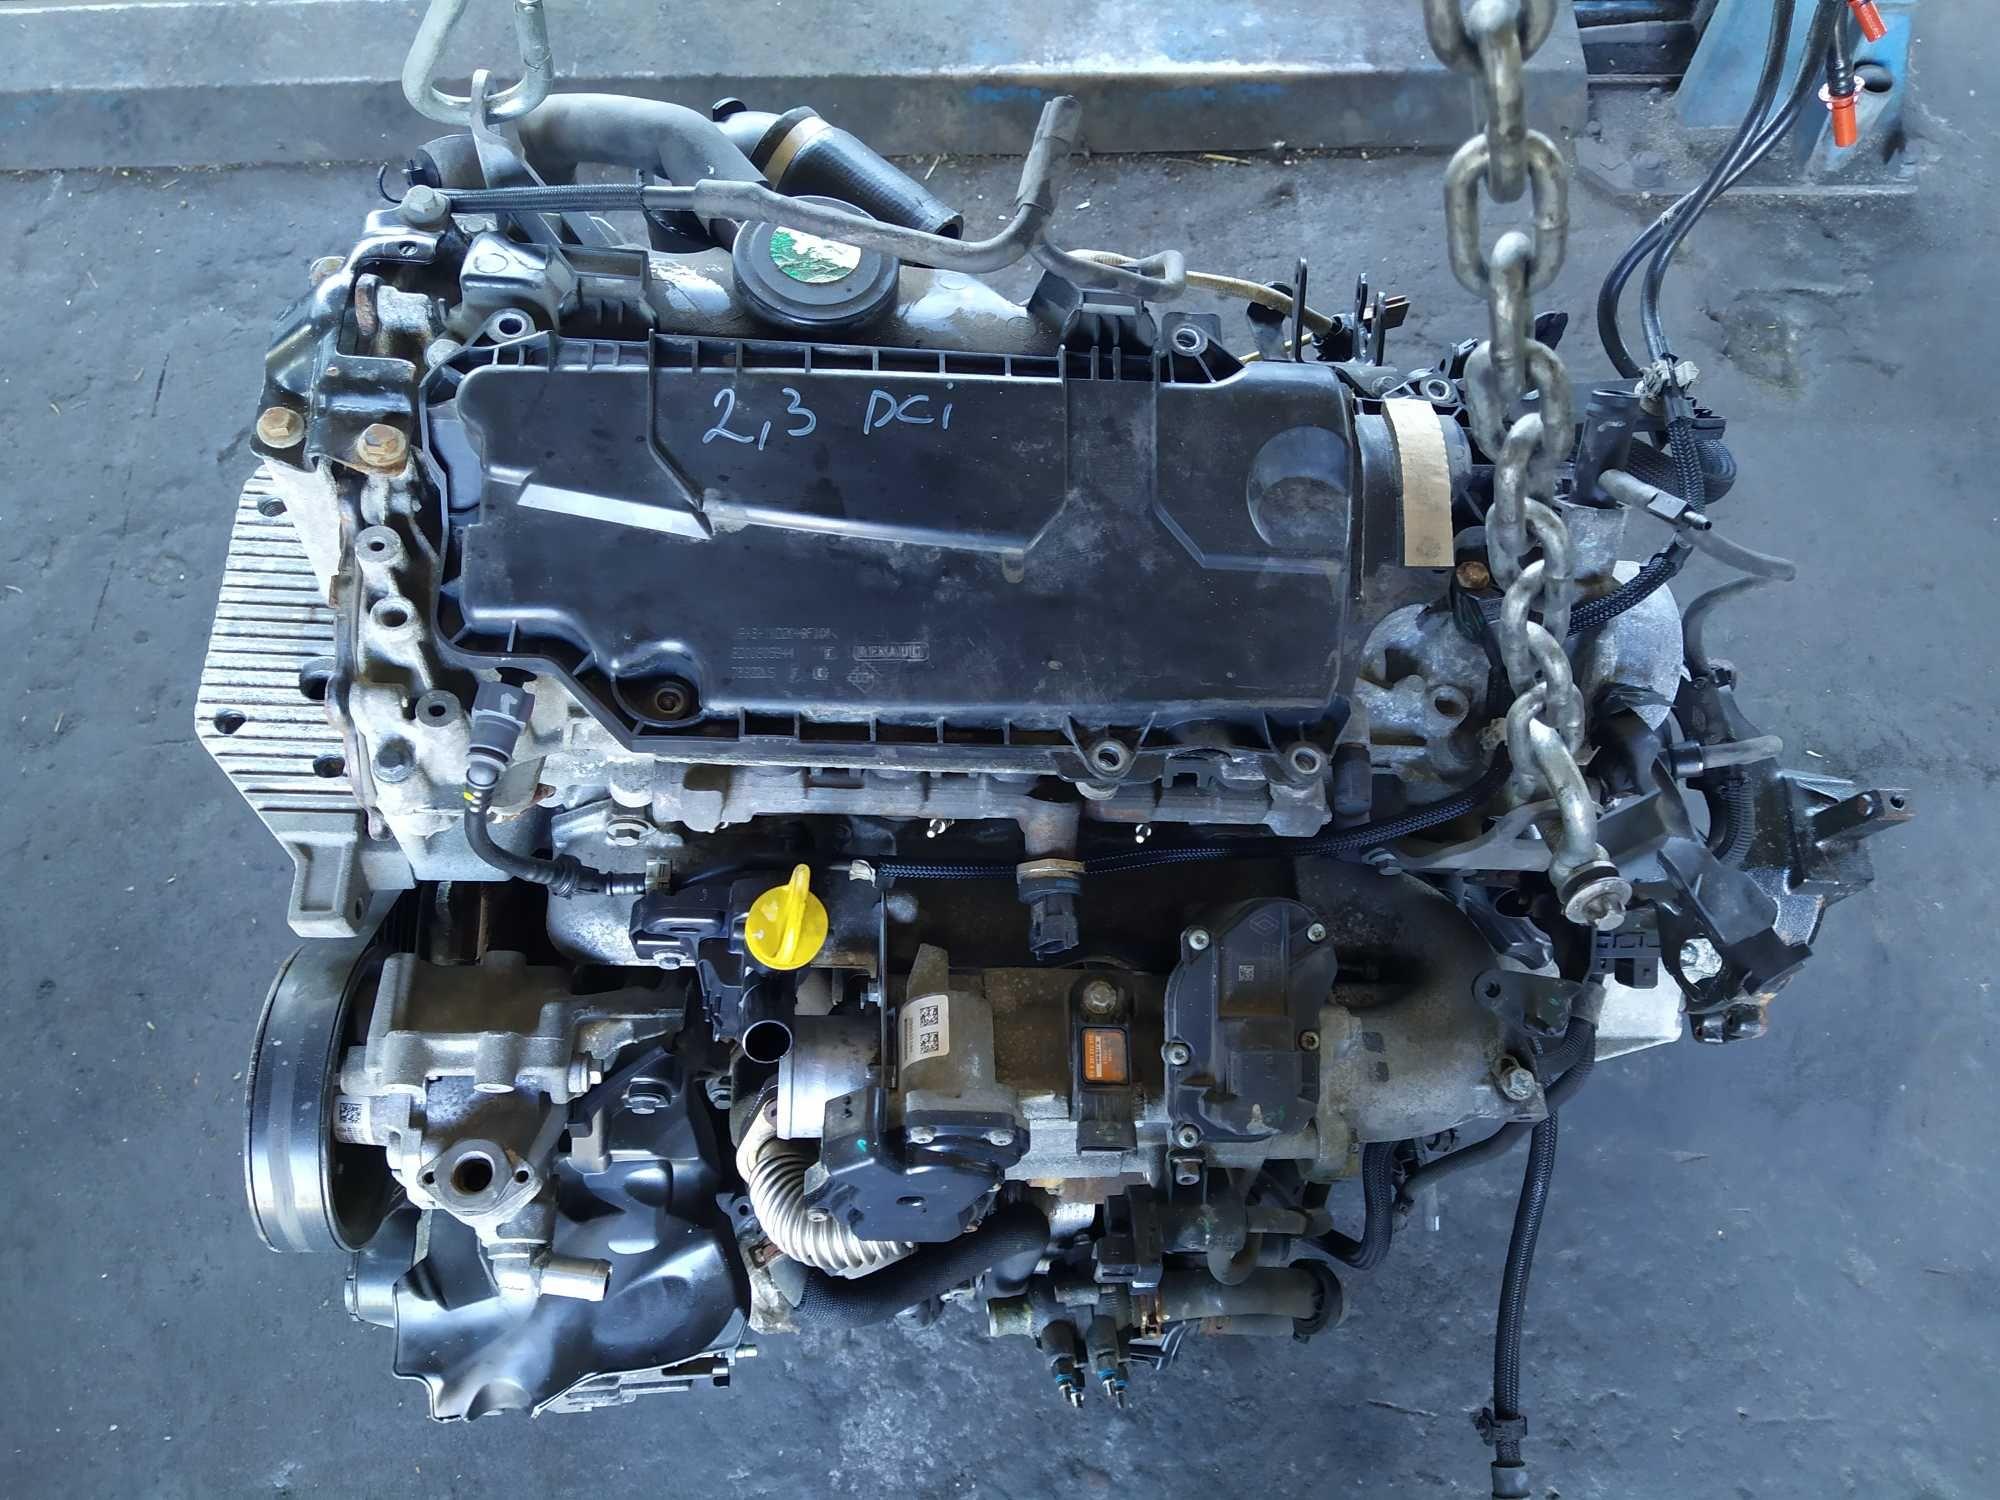 двигател и скорости Опел Мовано  2,3 DCI, Рено Мастър 3/Opel Movano